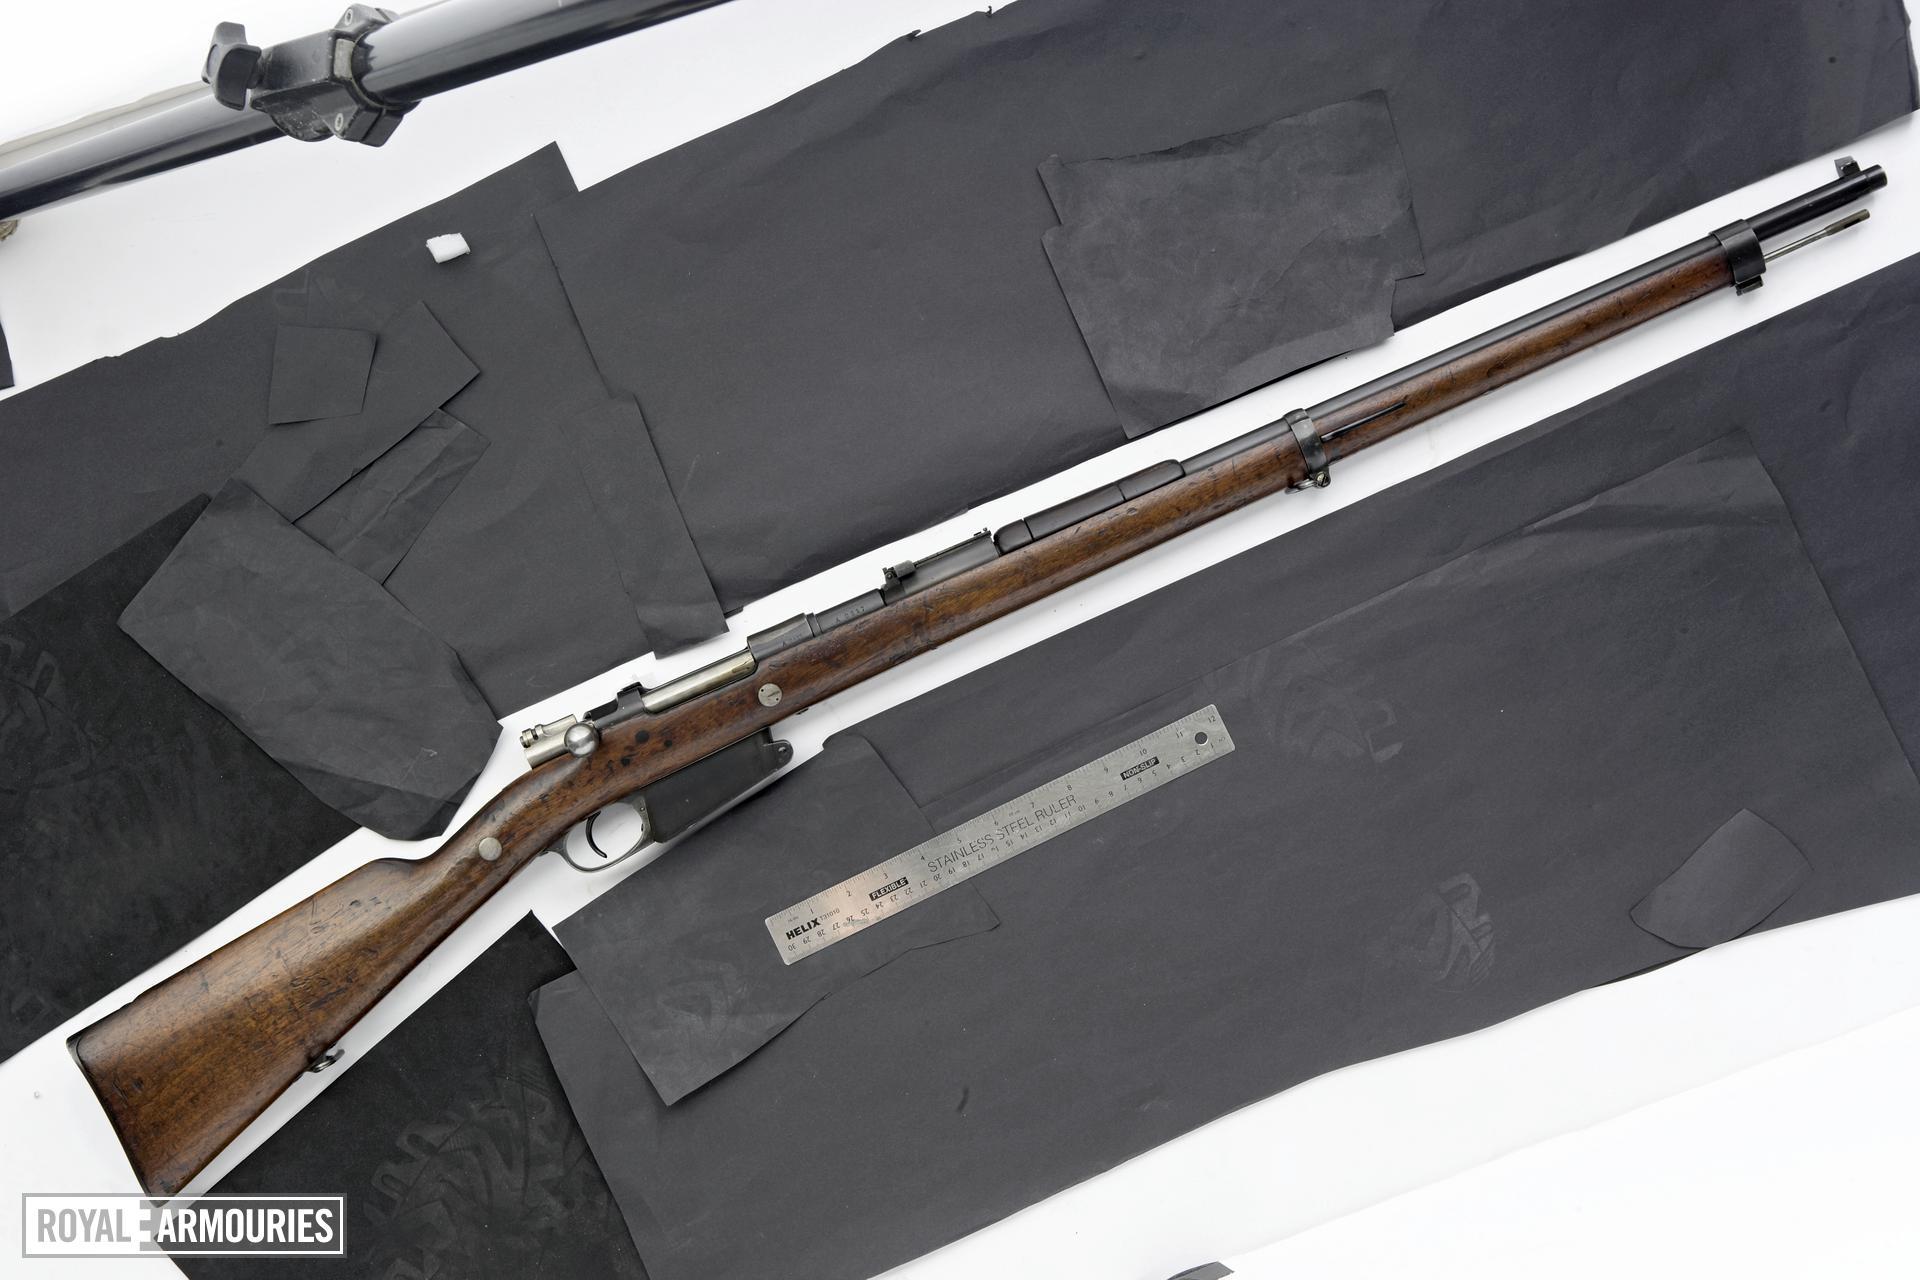 Centrefire bolt-action rifle - Mauser Model 1891